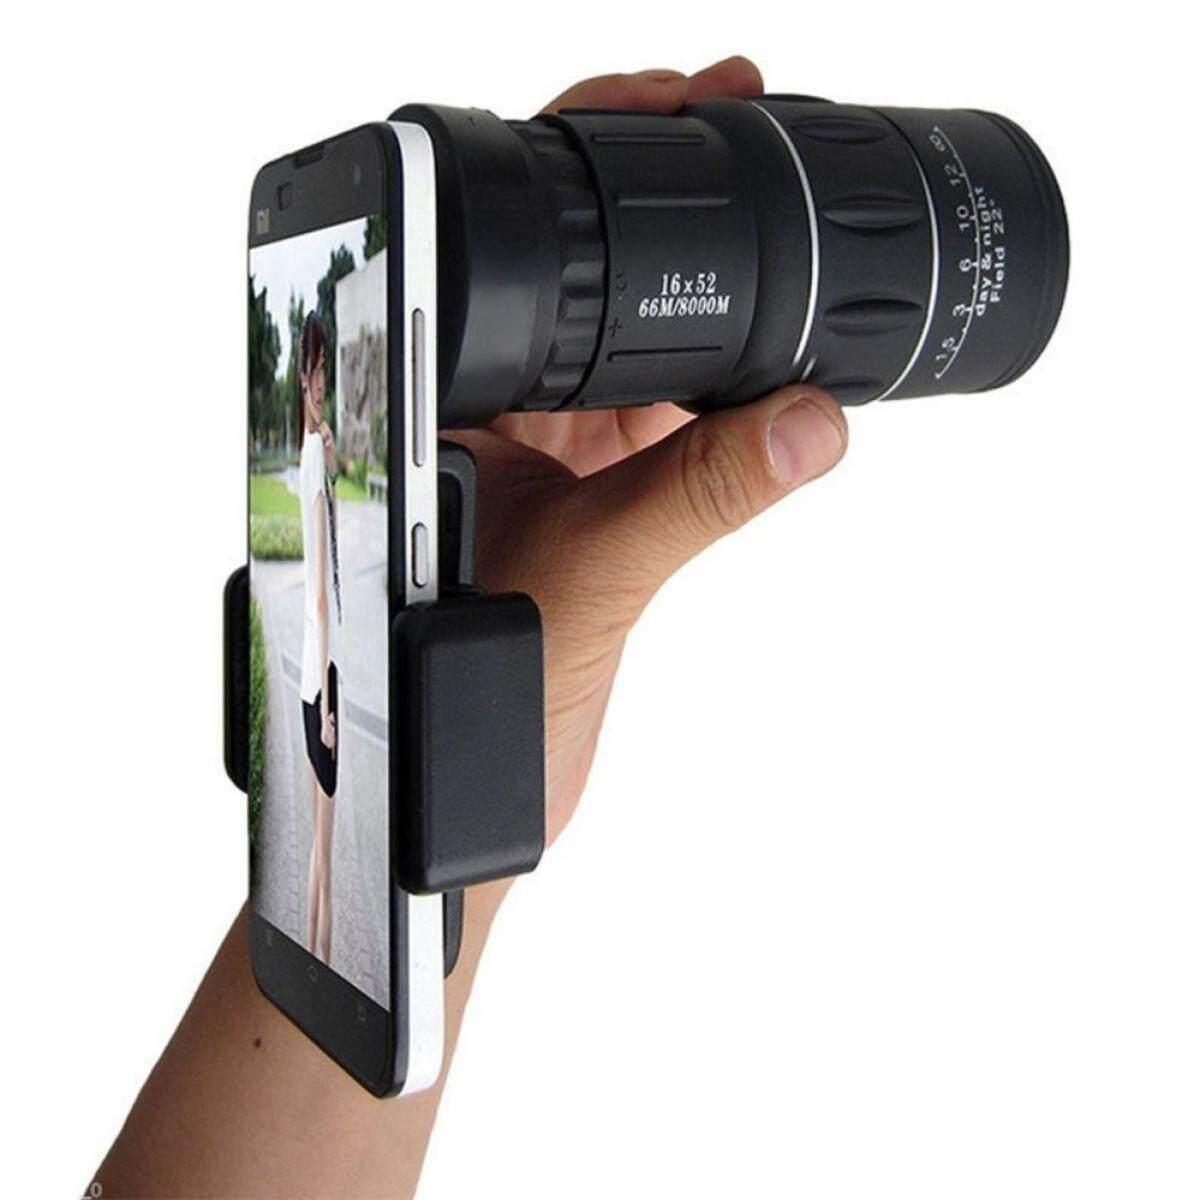 Cenblue 16x52 Zoom Dual Monokuler Fokus Lensa Teleskop Kamera 66 M/8000 M Hd Scope + Tempat Ponsel By Cenblue Story.